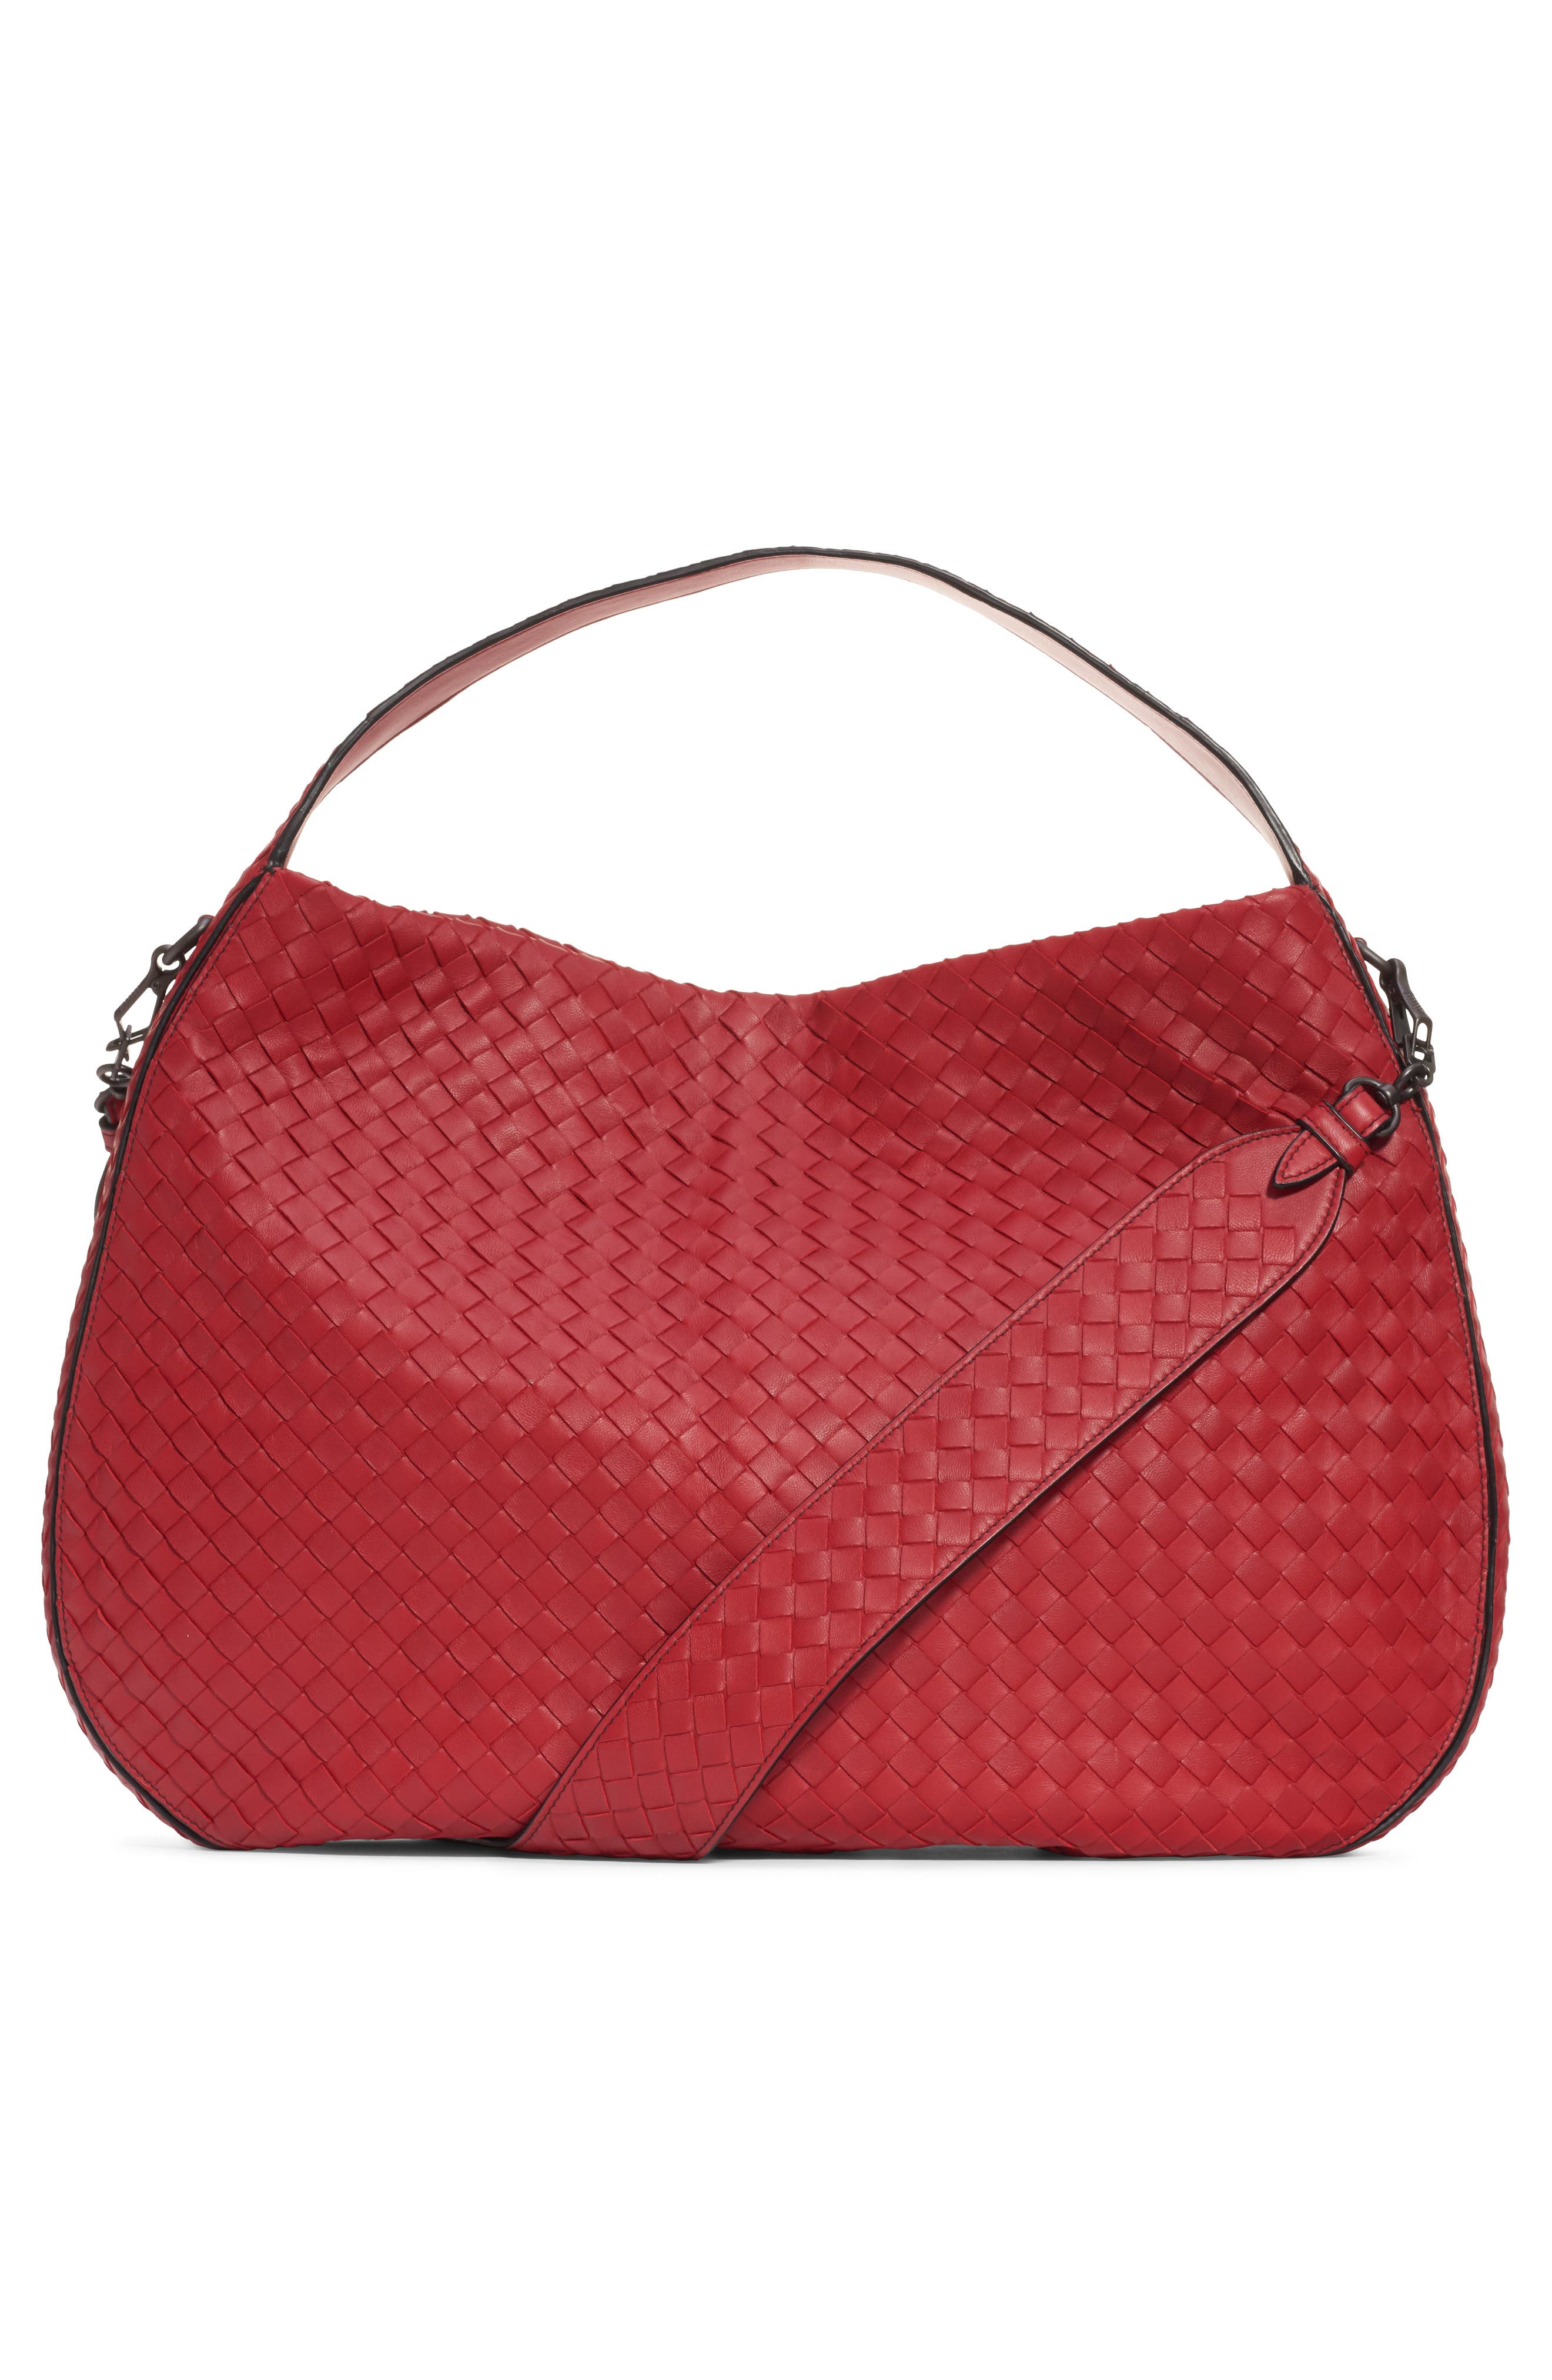 BOTTEGA VENETA, City Veneta Shoulder Bag, Alternate thumbnail 2, color, BACCARA RED-NERO/ BRUNITO